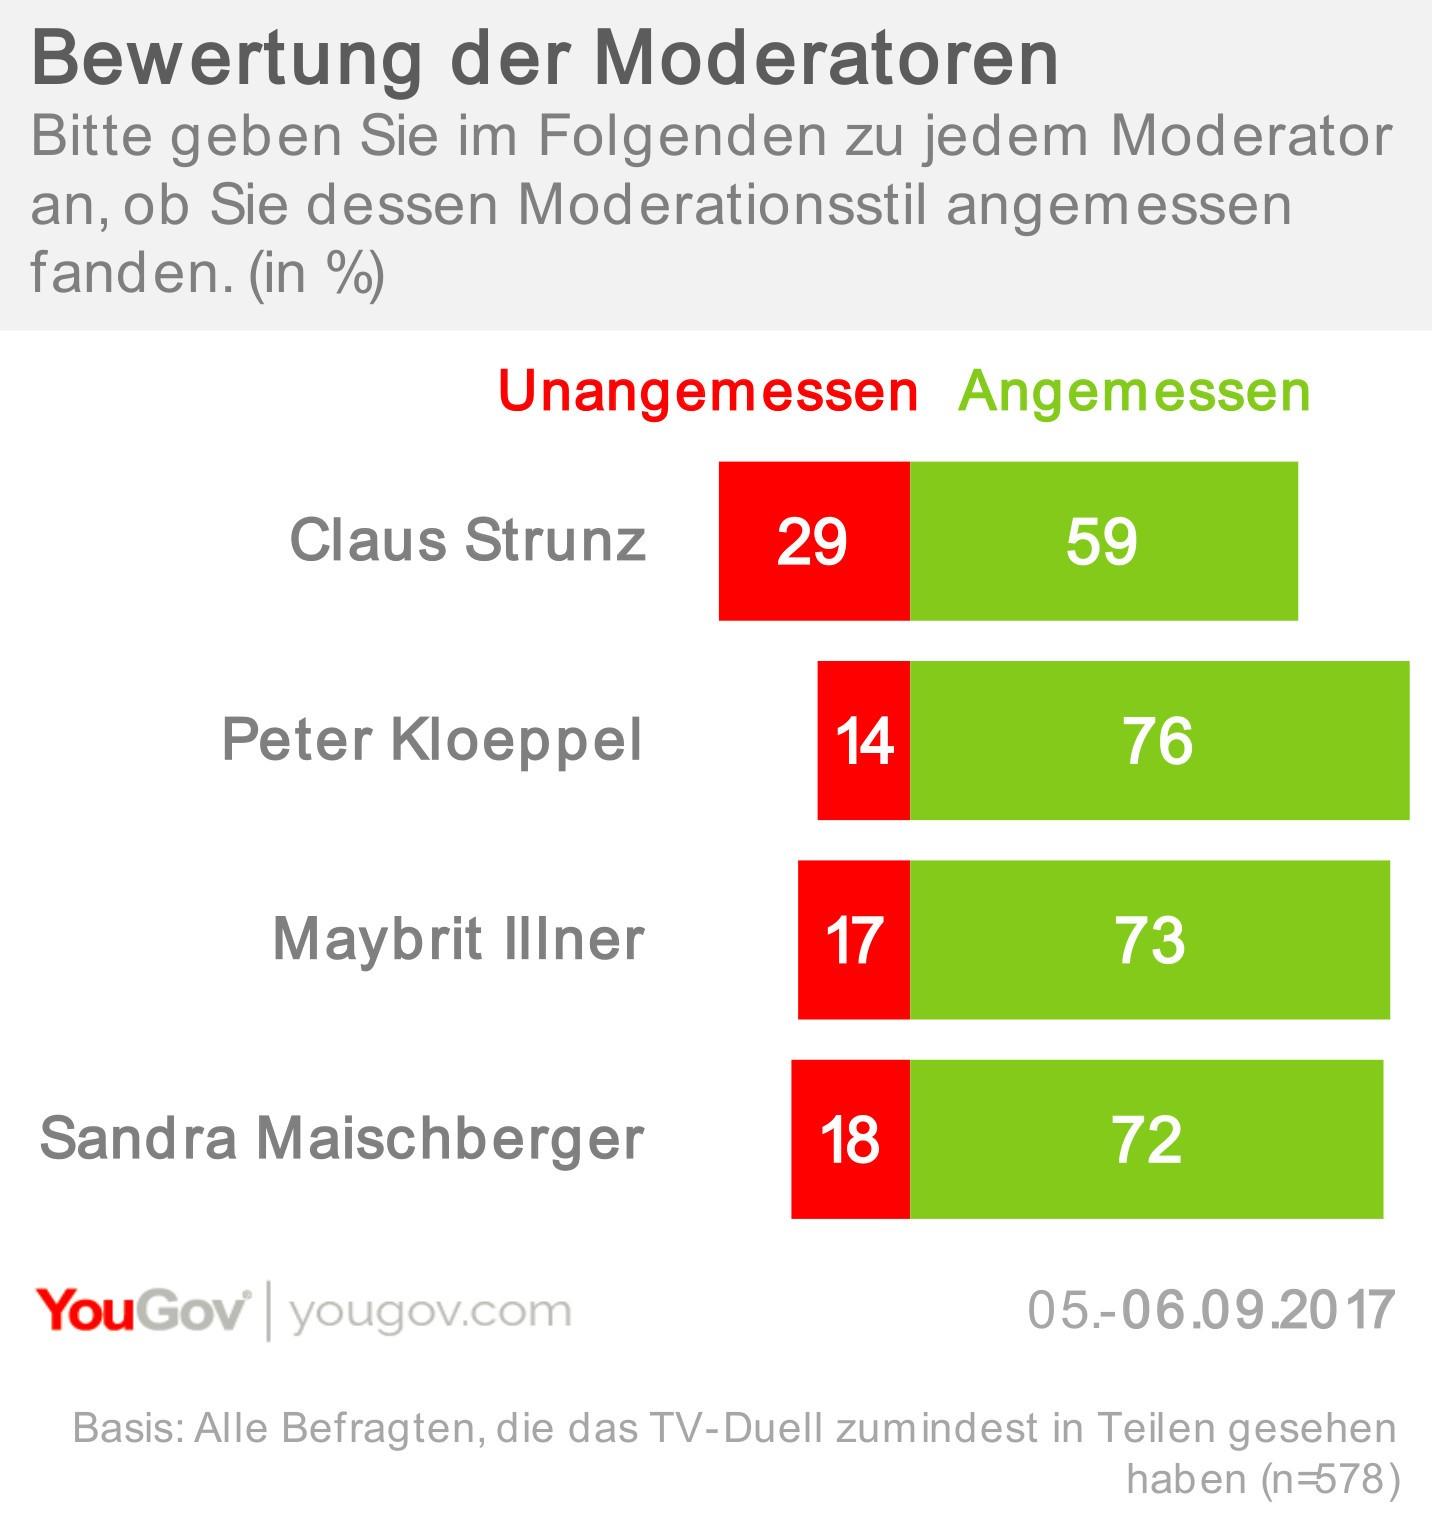 Bewertung der Moderatoren